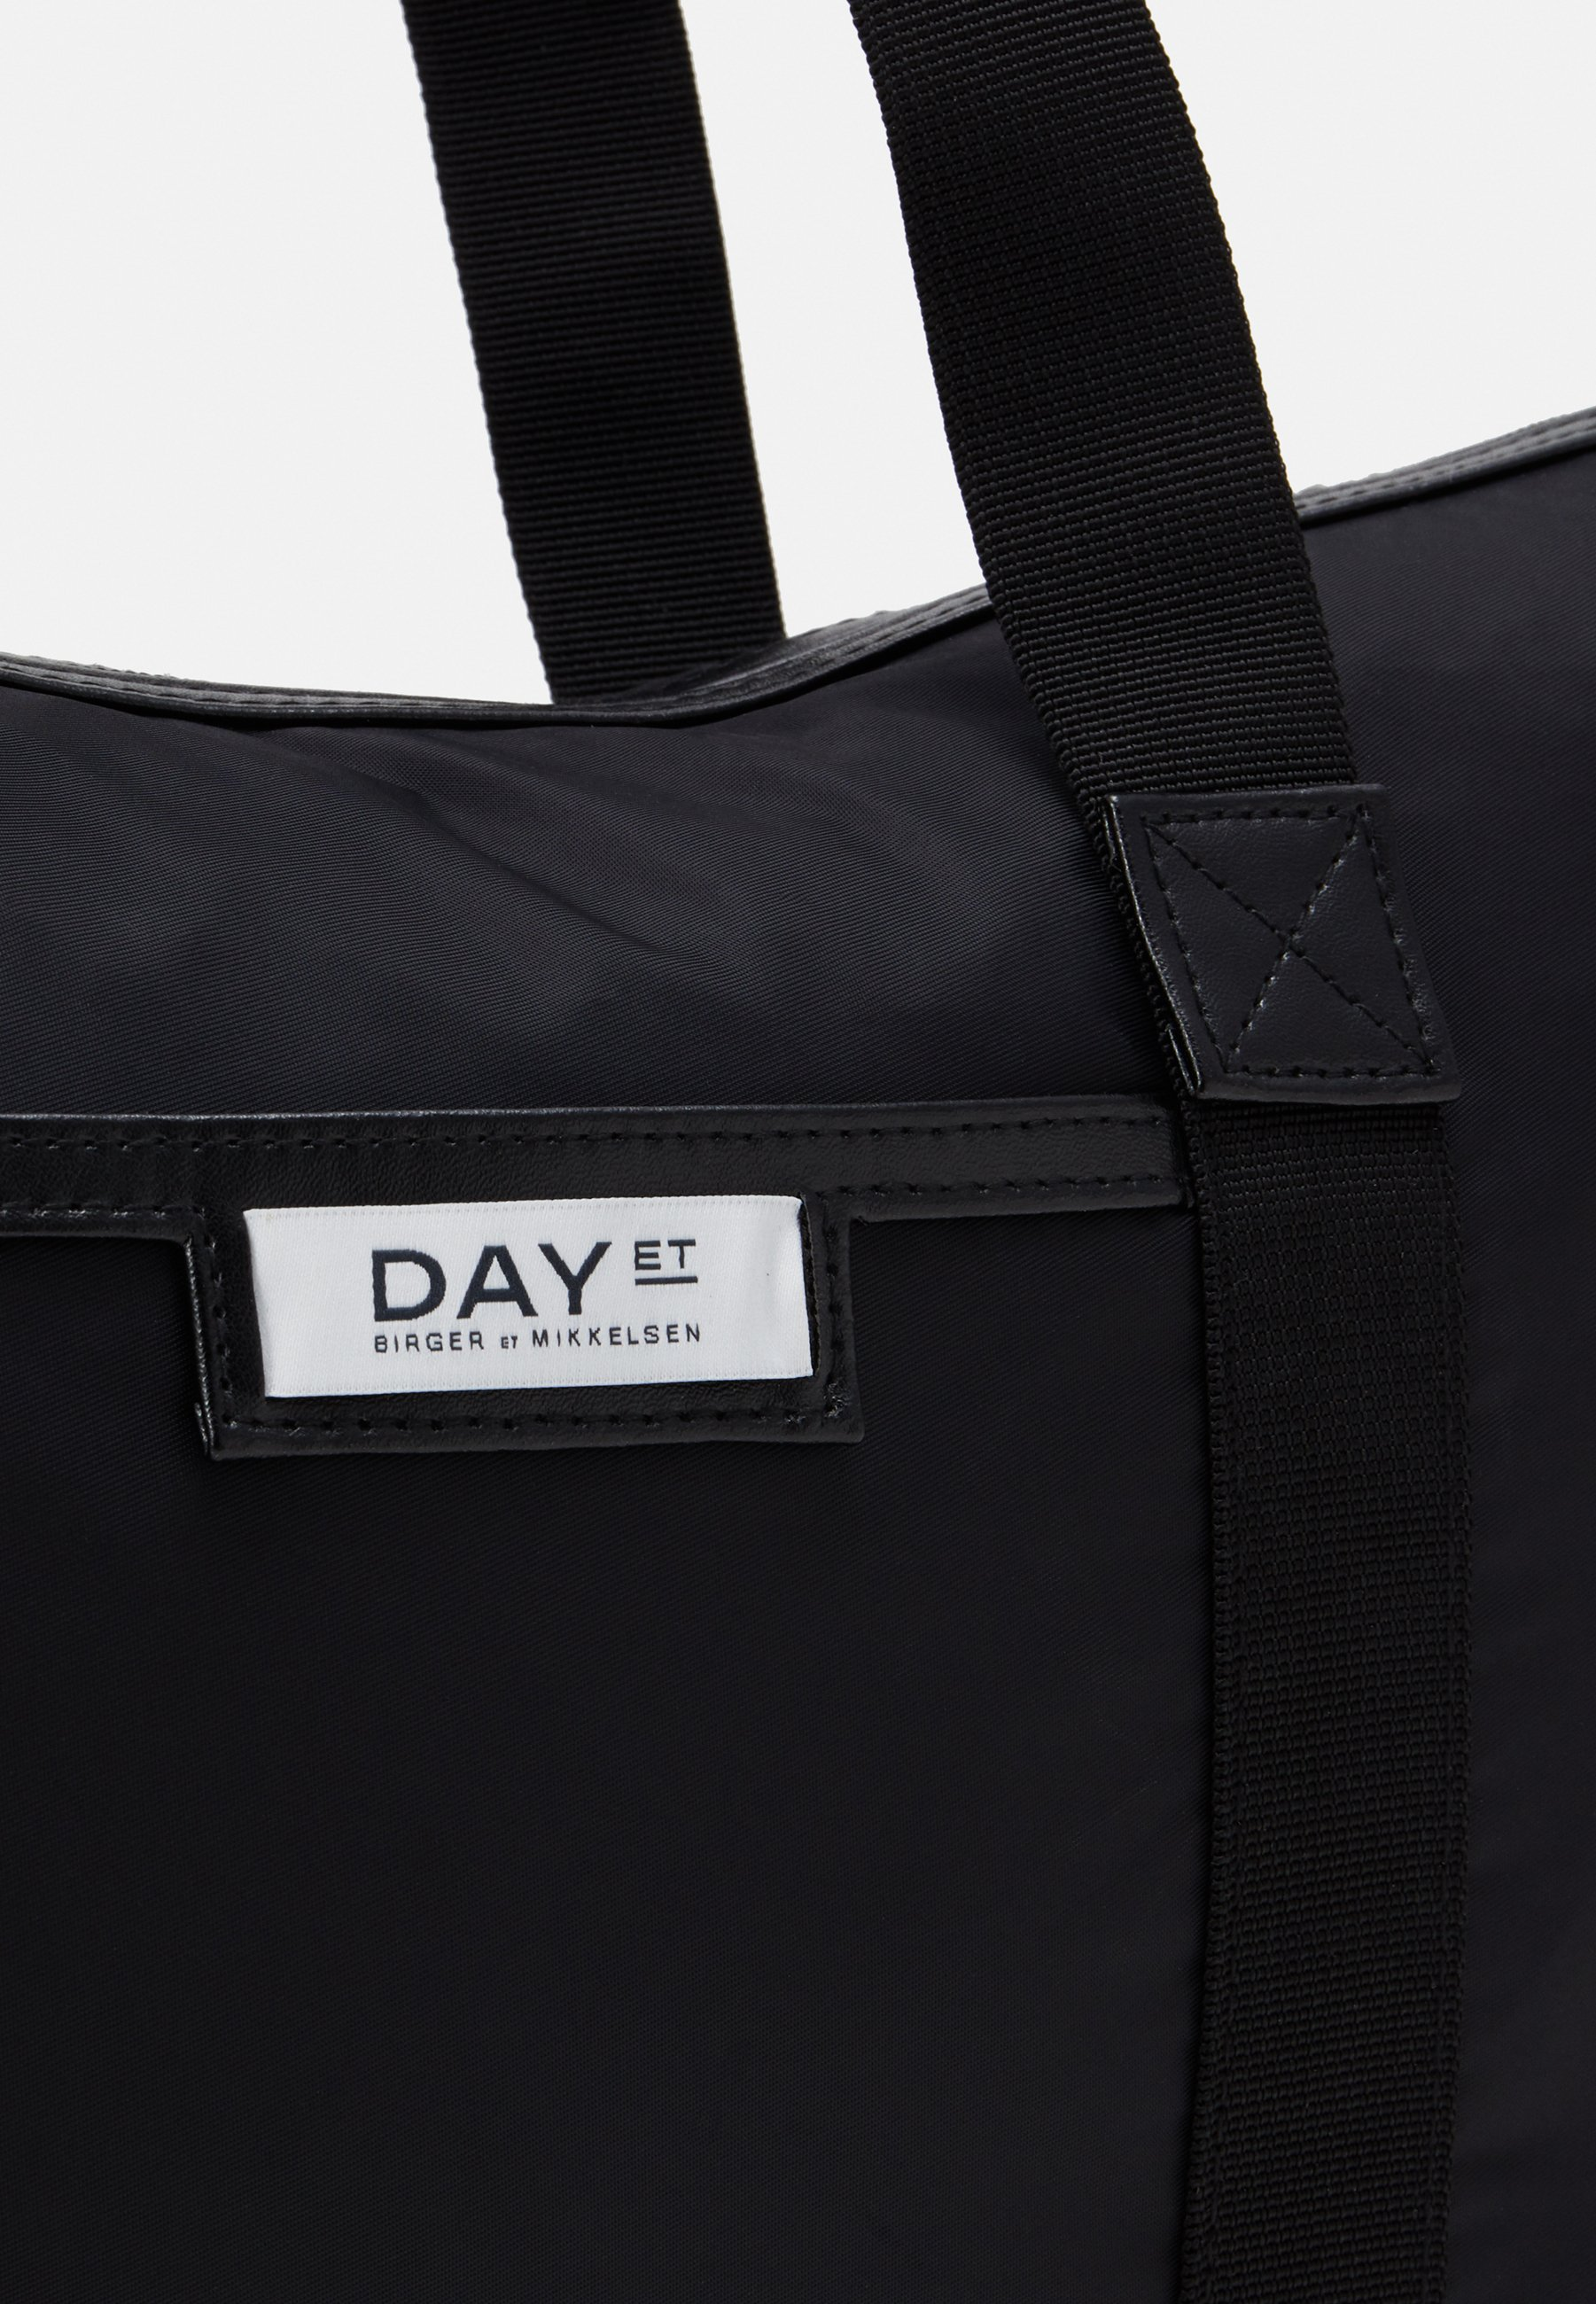 DAY ET GWENETH WORK - Shoppingveske - black/svart O1wdMQbsdup1gav